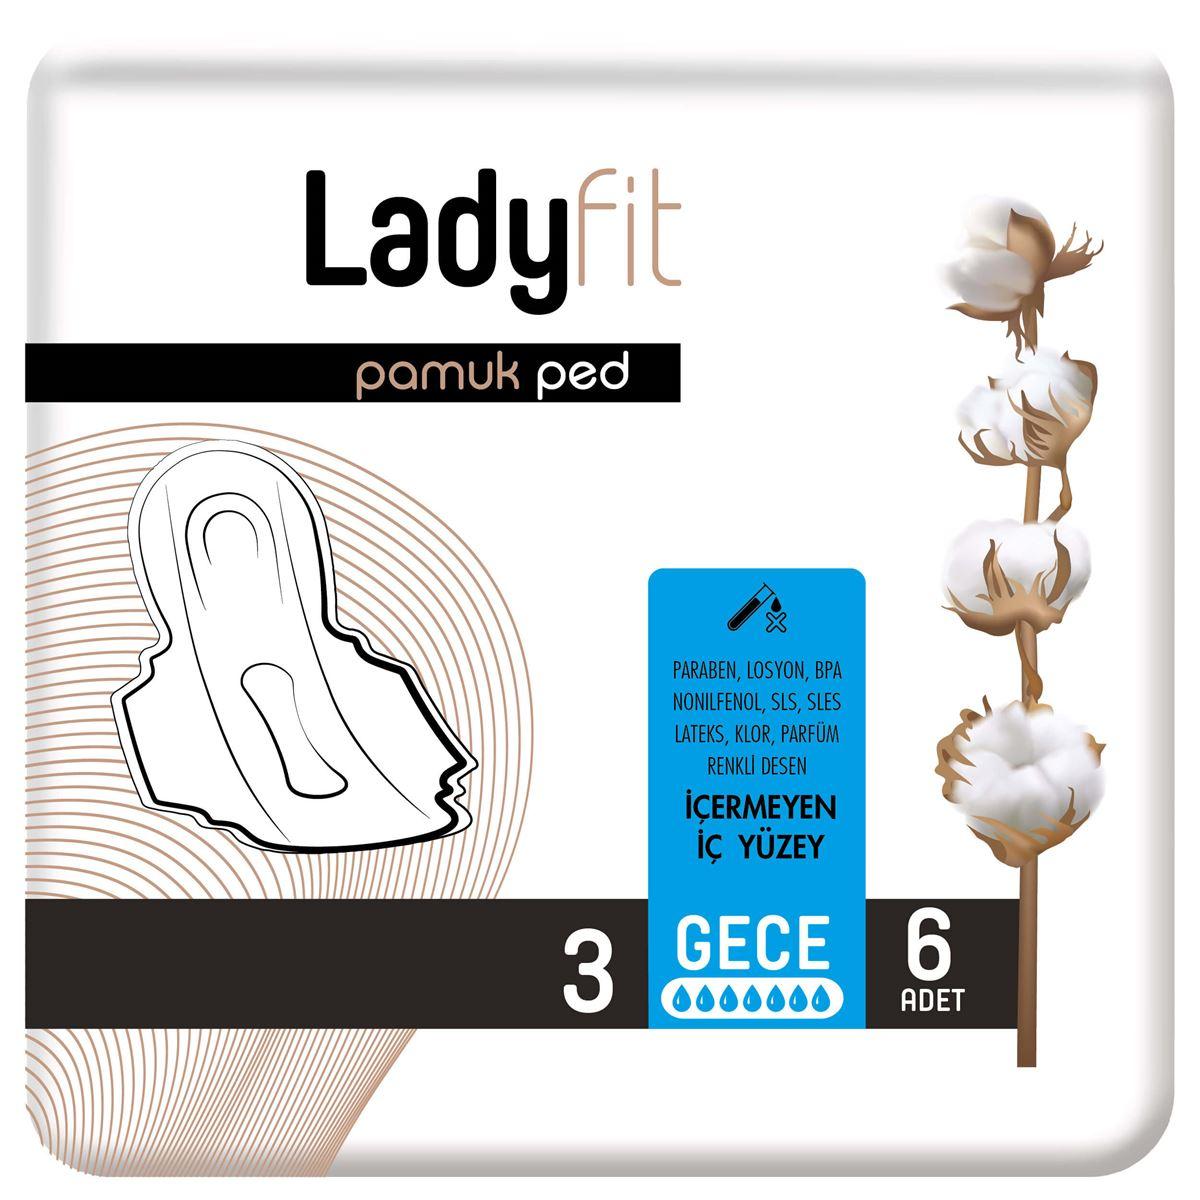 Ladyfit Pamuk Ped Standart Gece 6 Ped